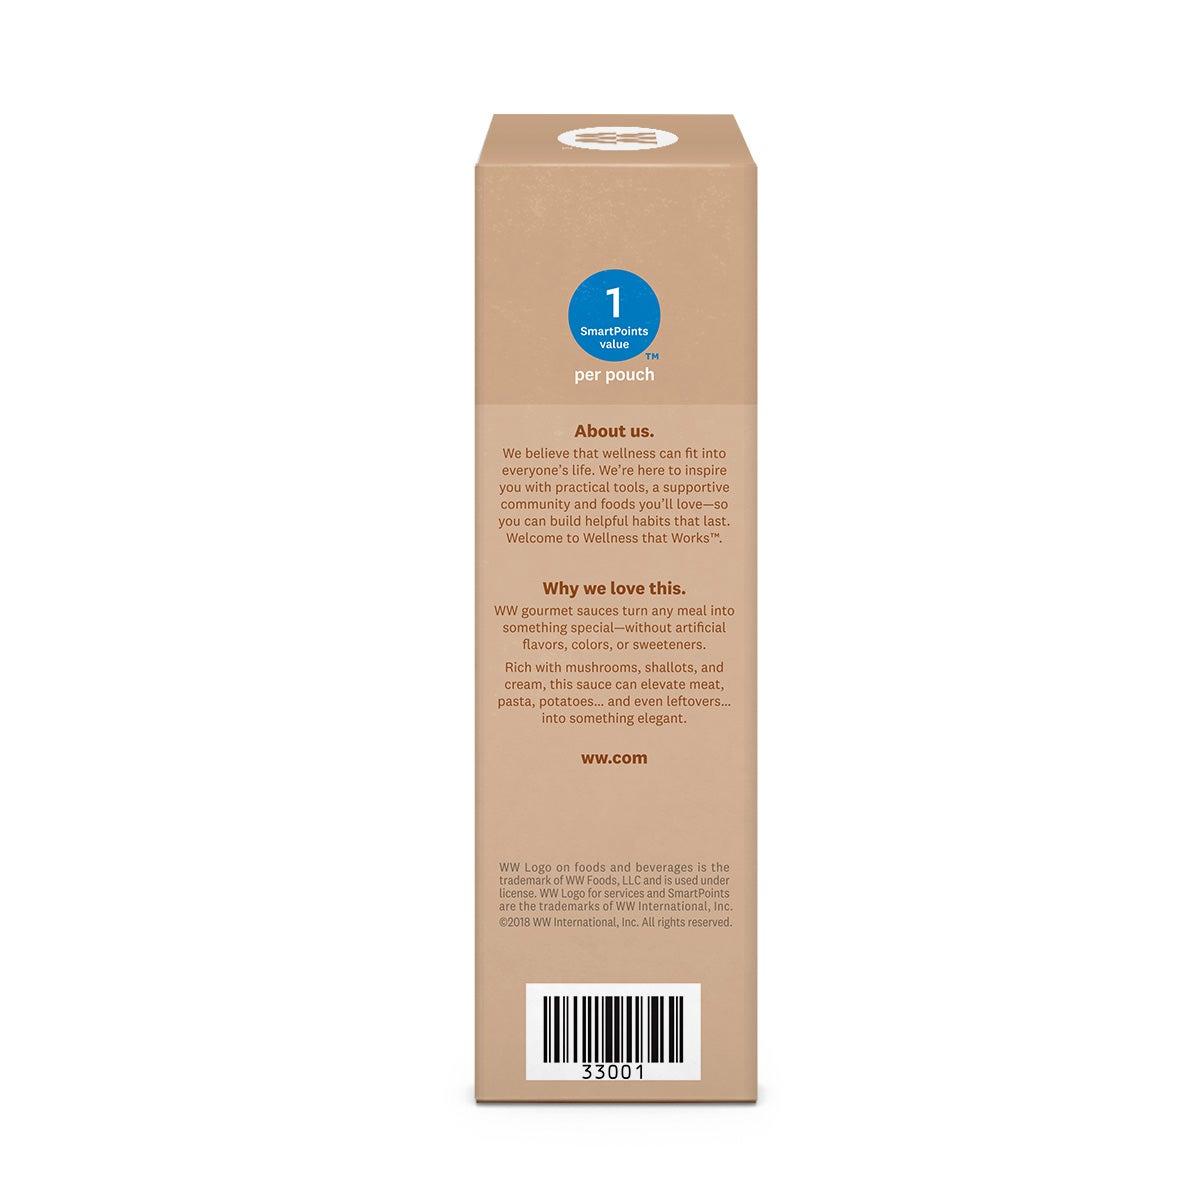 Creamy Mushroom Gourmet Sauce - side of box 2